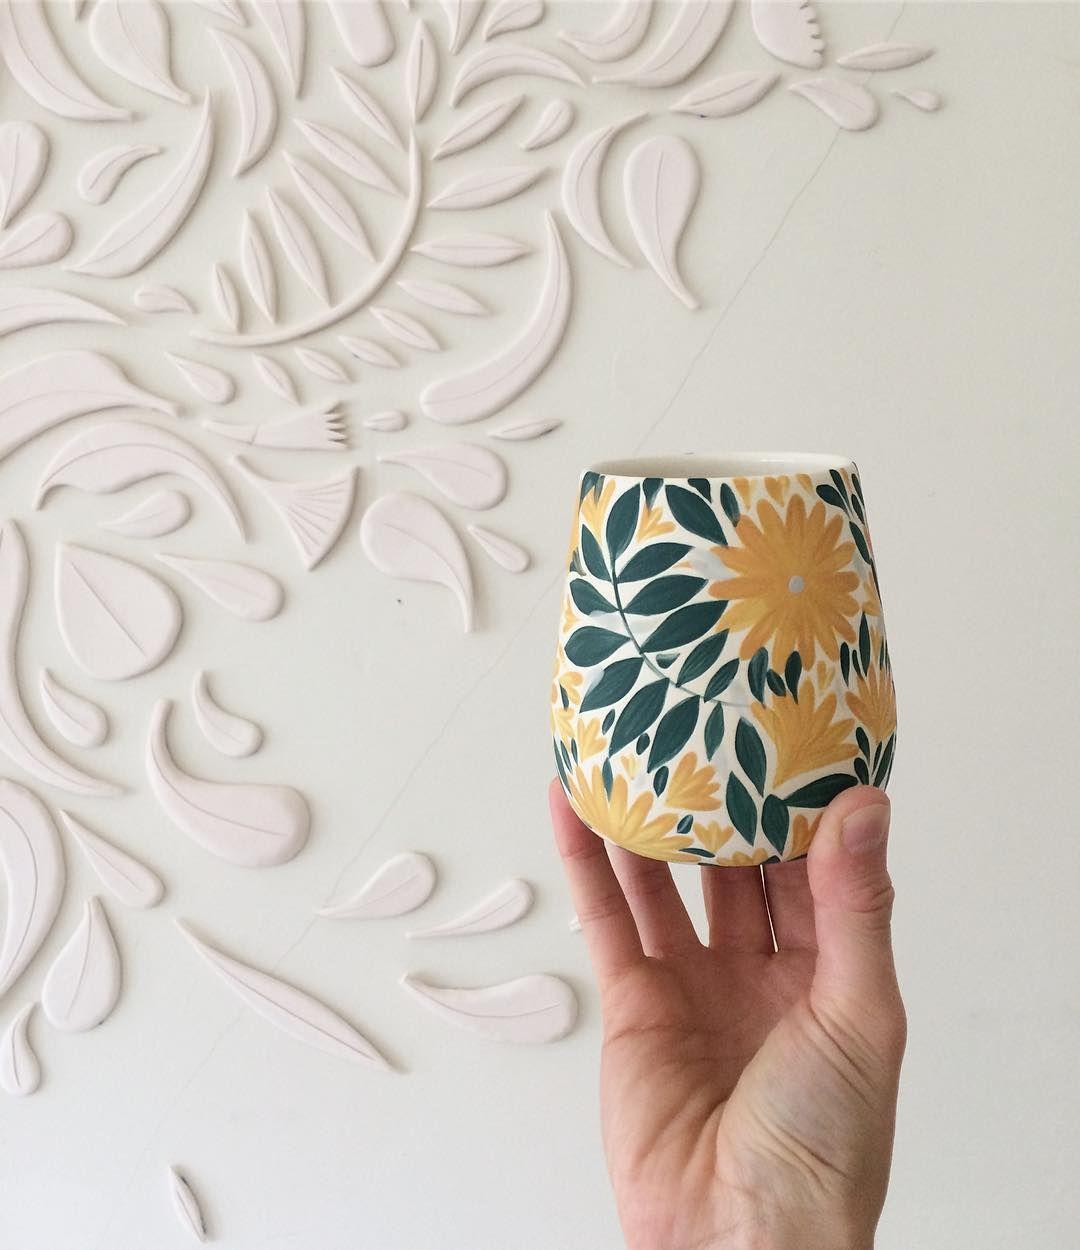 Swirl it together, no boundaries 🌿🌼✨ . . . . #anastasiatumanova #botanicalceramics #ceramics #keramik #porcelain #illustratedceramics…